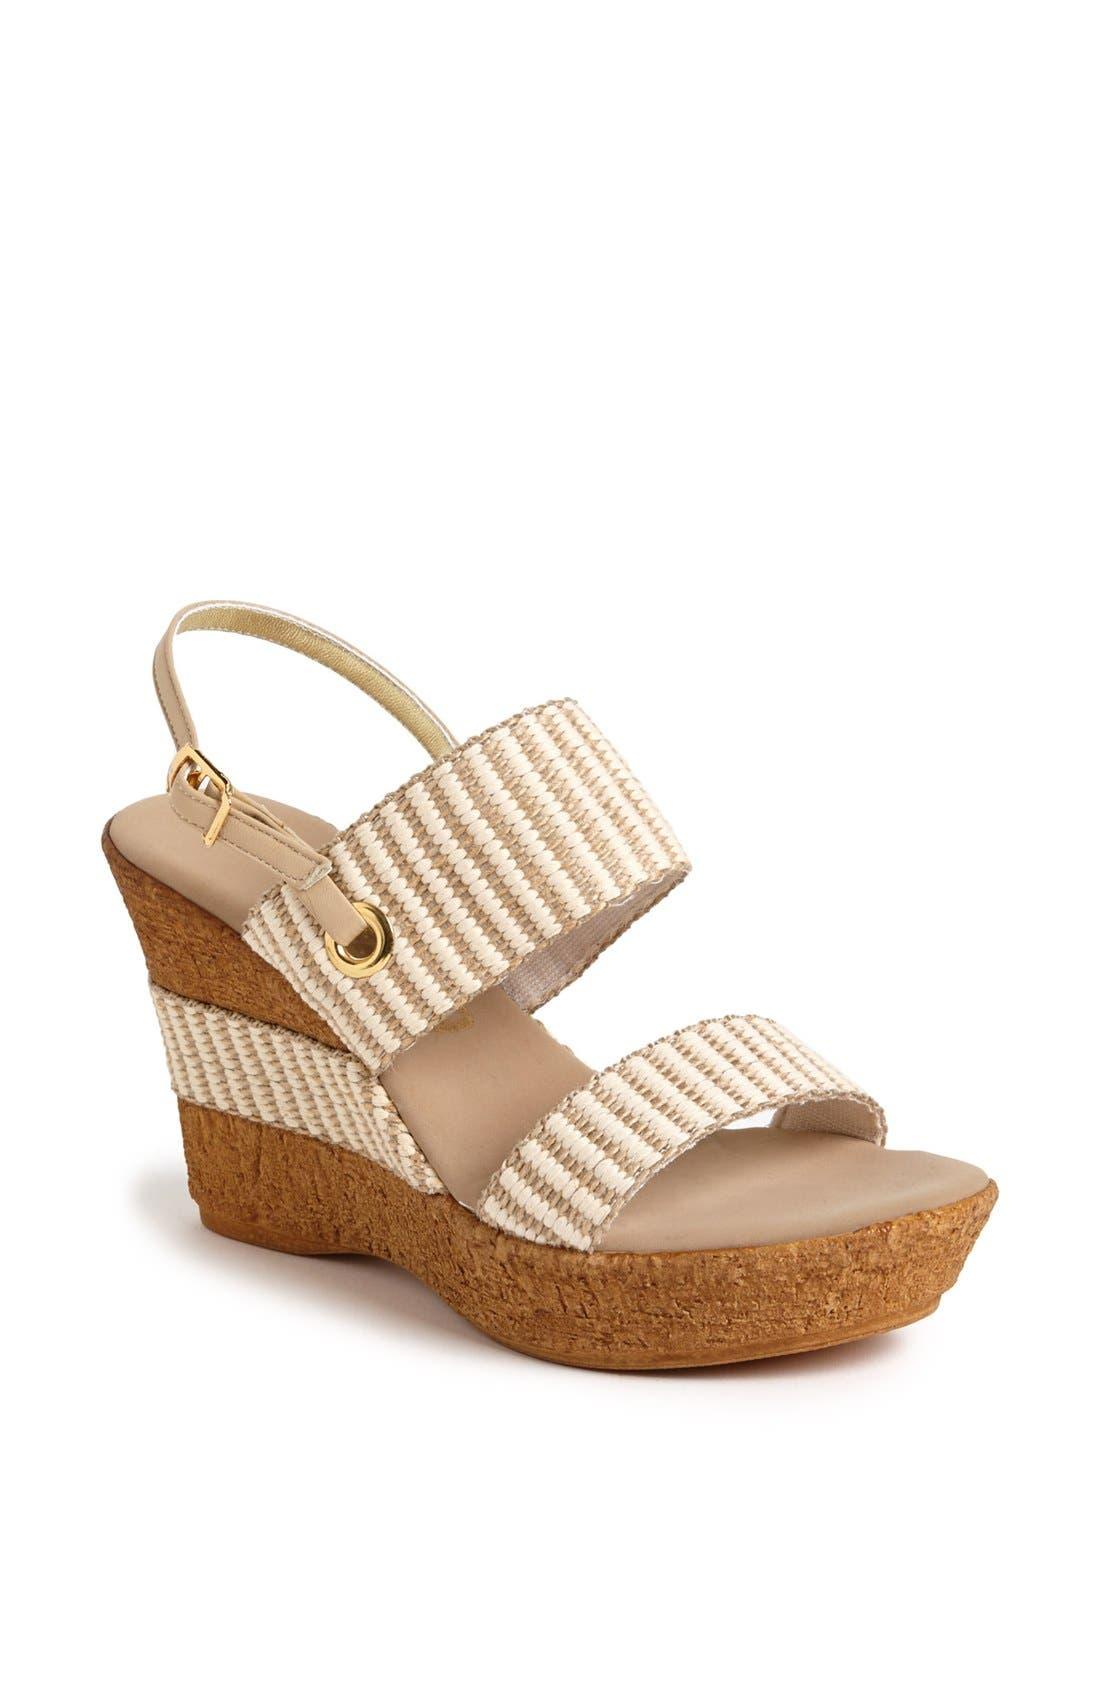 Main Image - Onex 'Thalia' Sandal